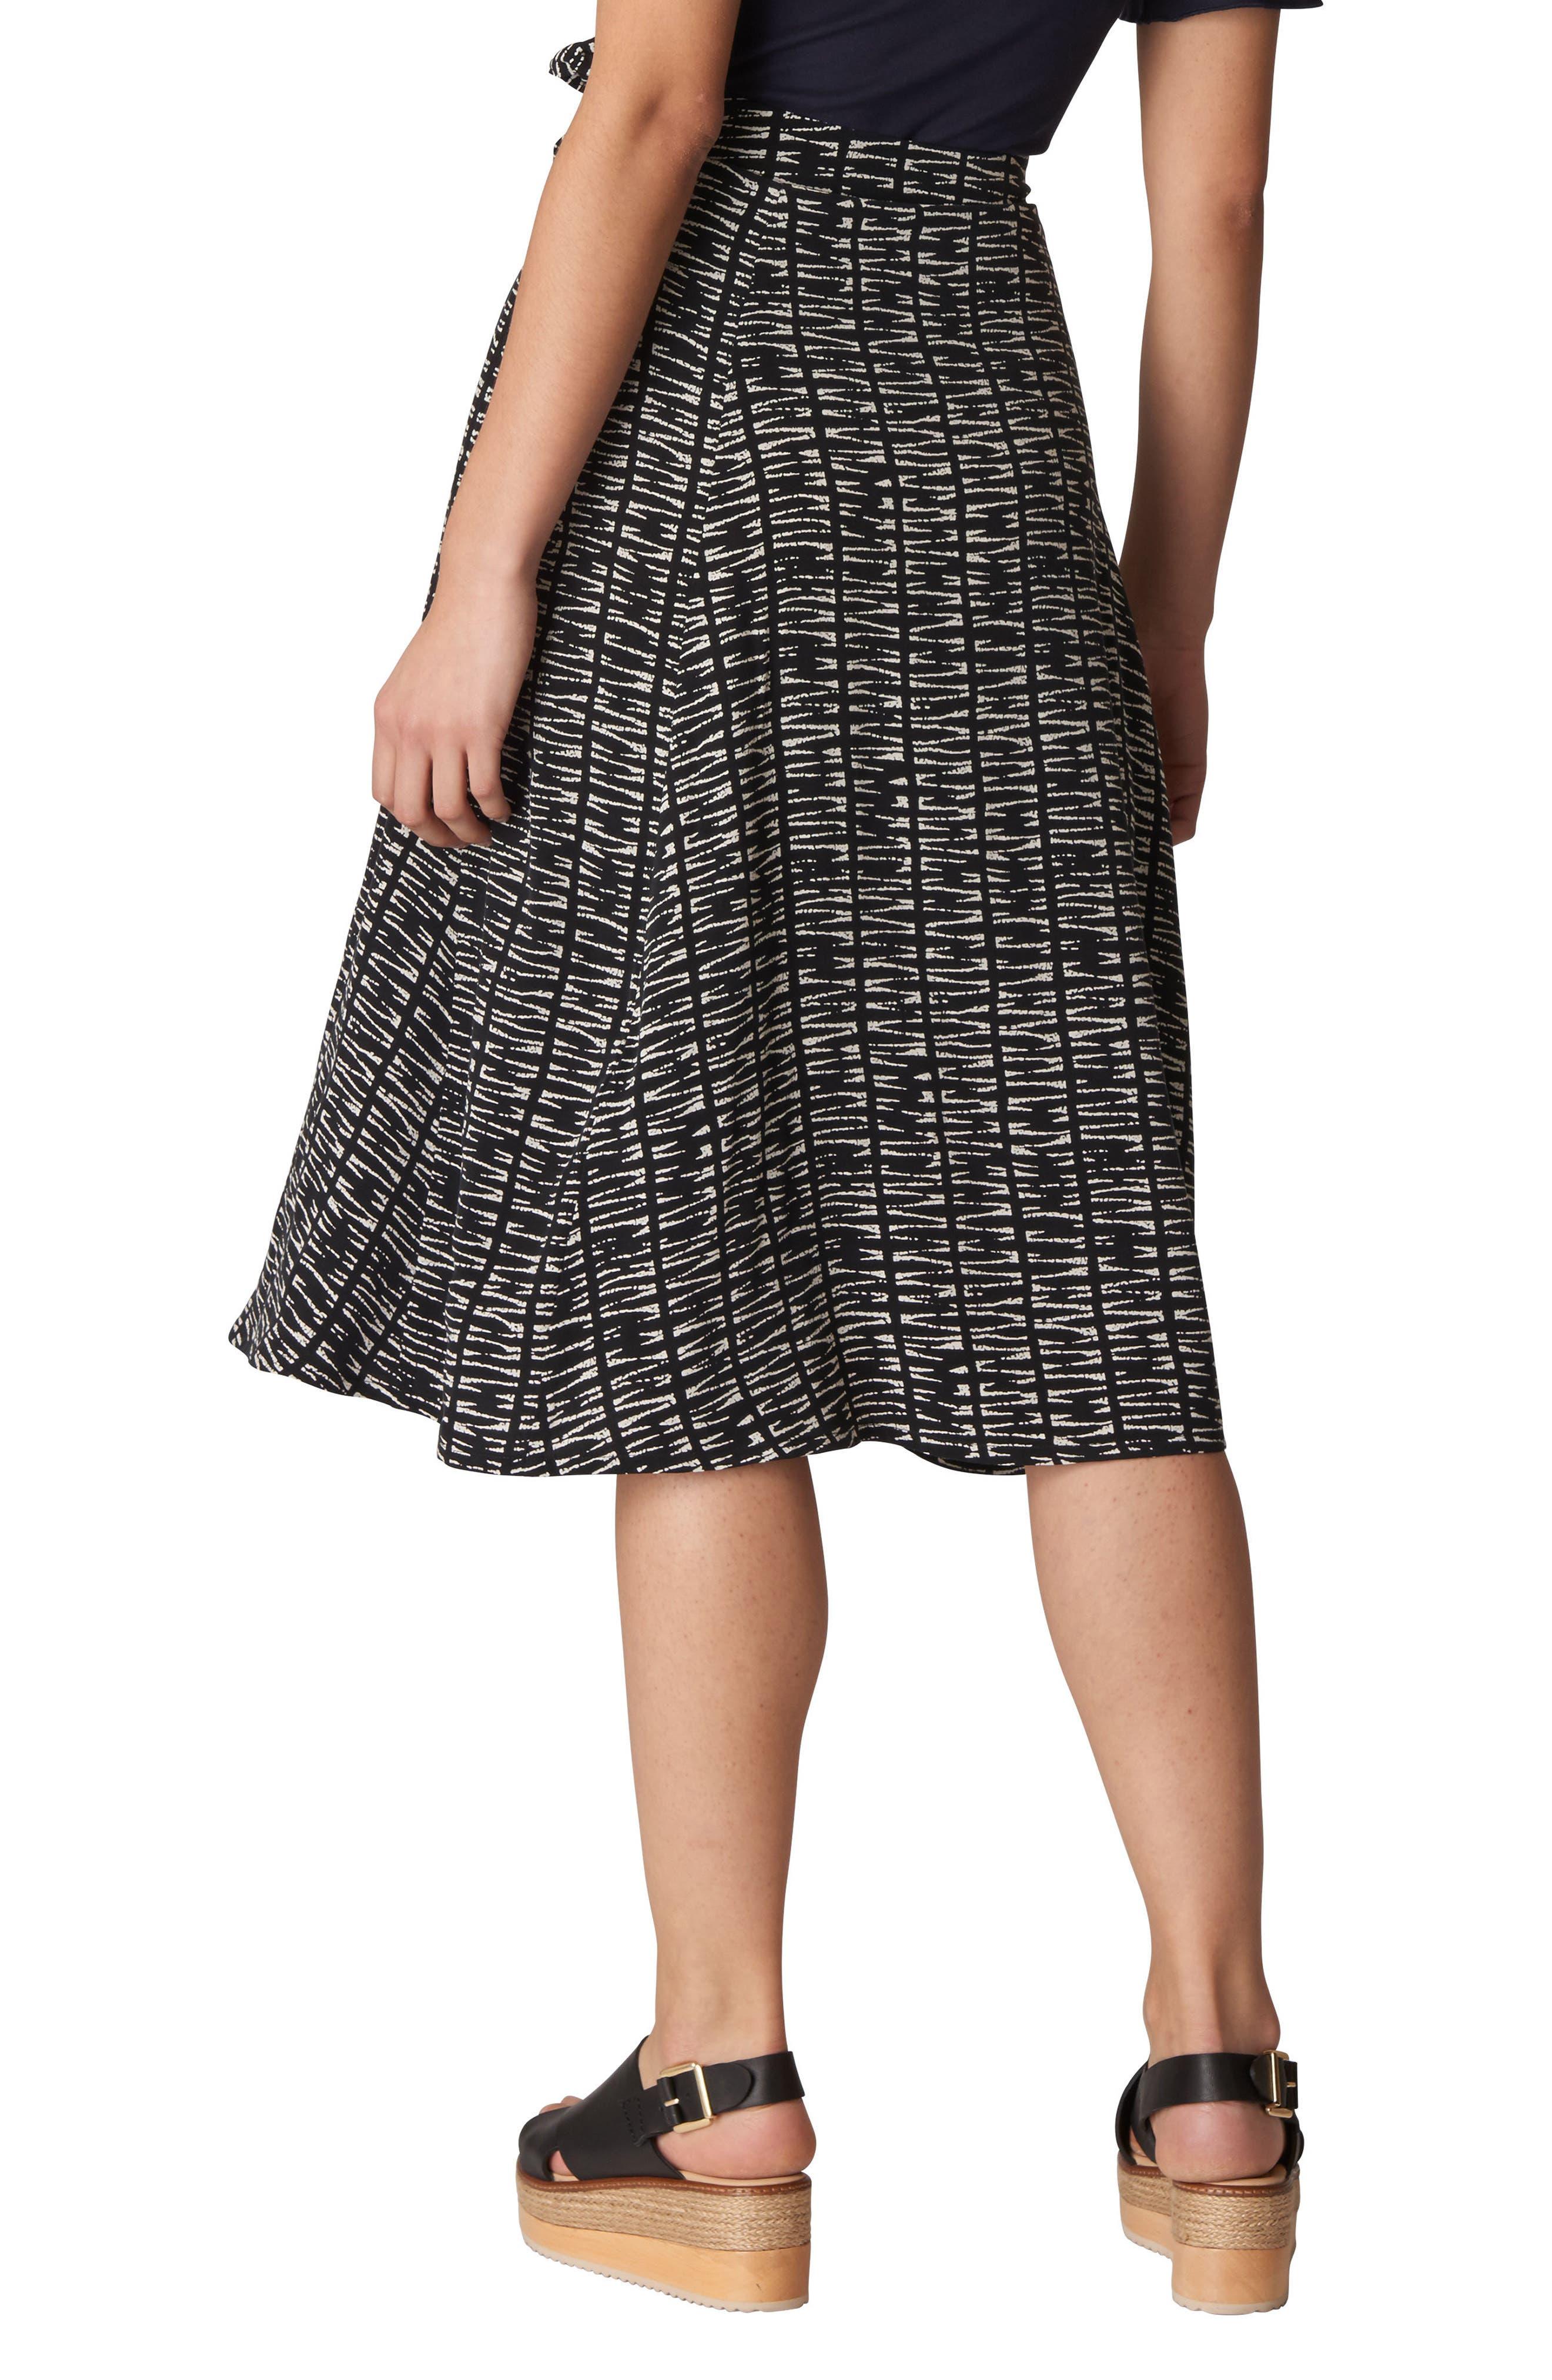 Avie Sahara Print Wrap Skirt,                             Alternate thumbnail 2, color,                             Black/ Multi